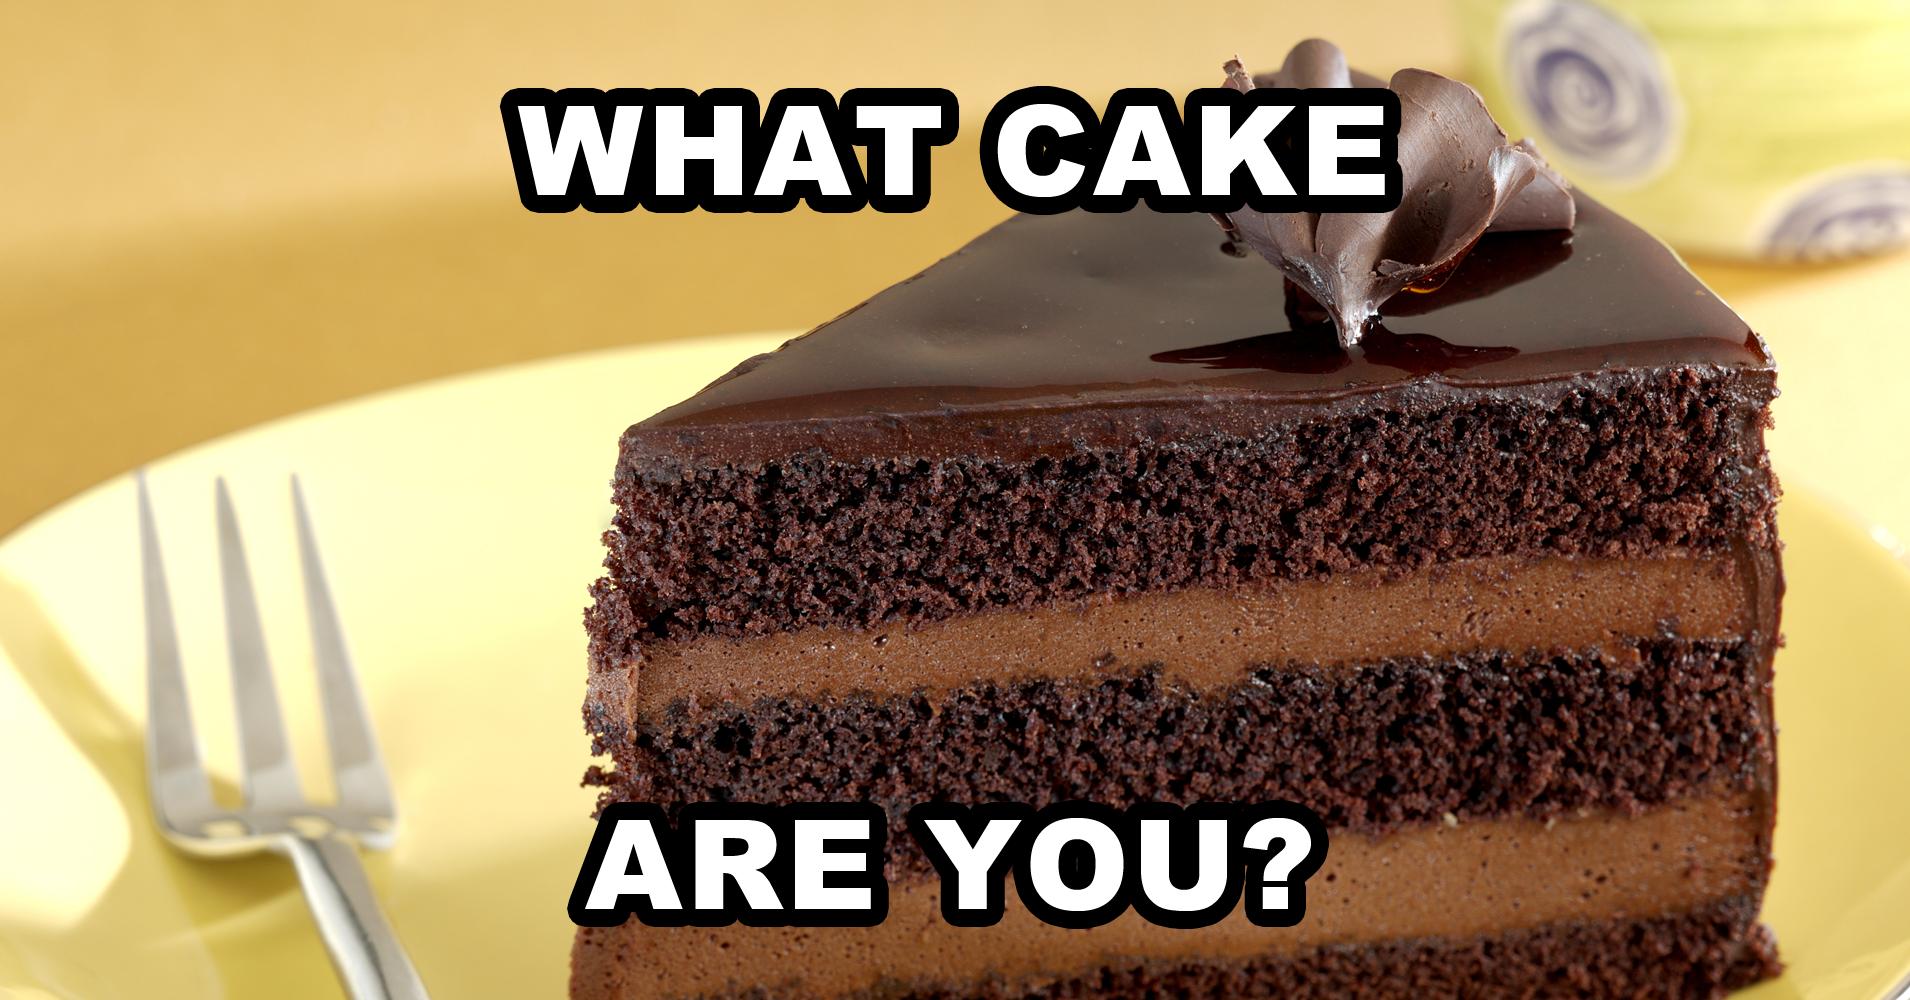 Pics Quiz Cake Art Mo : What Kind of Cake Are You? - Quiz - Quizony.com